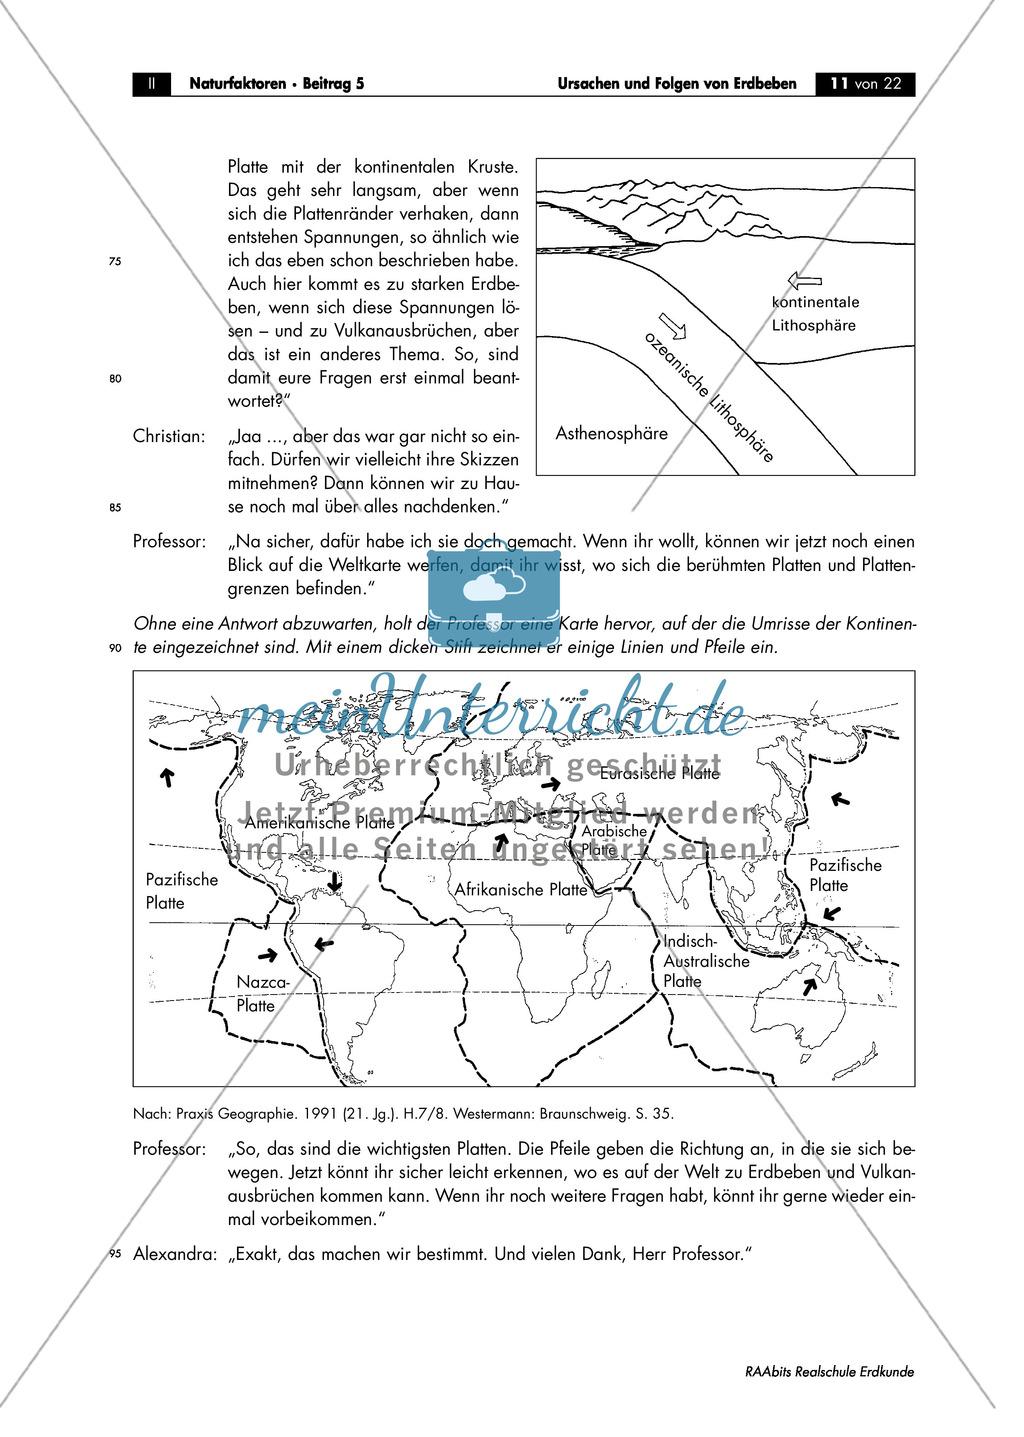 Erdbeben: Ursache endogener Vorgänge + Schalenaufbau der Erde ...